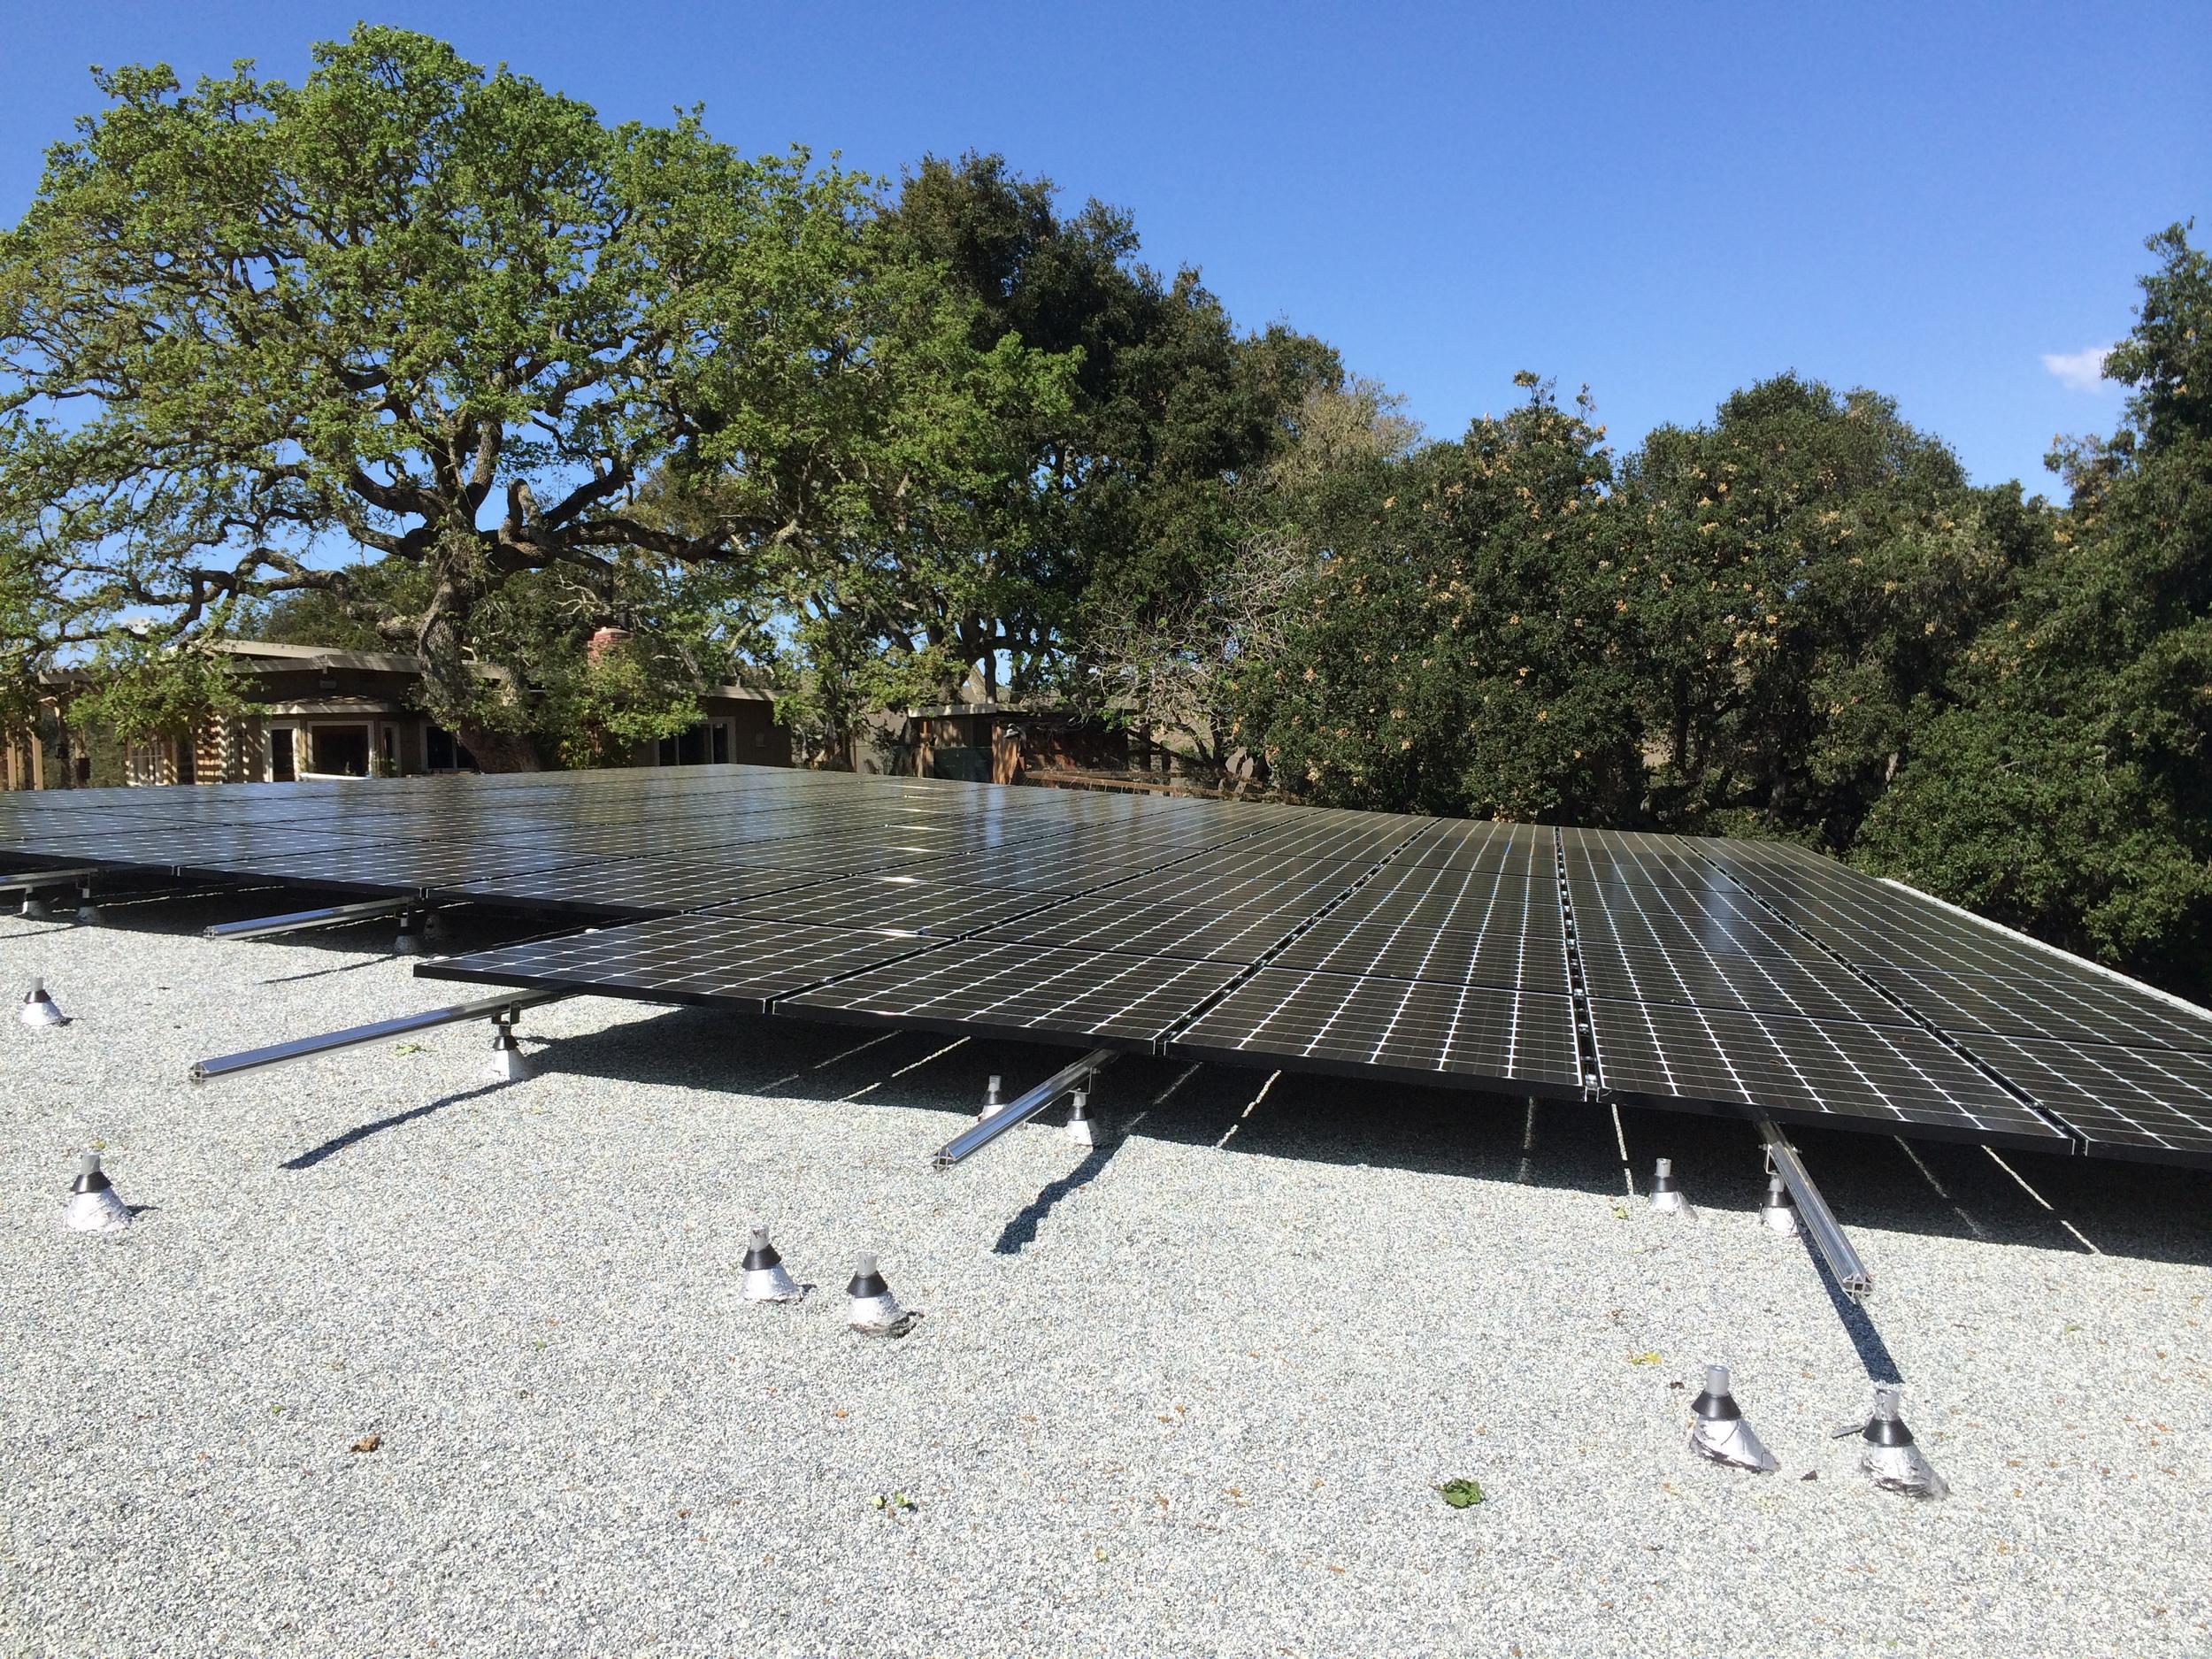 20 kilowatt system